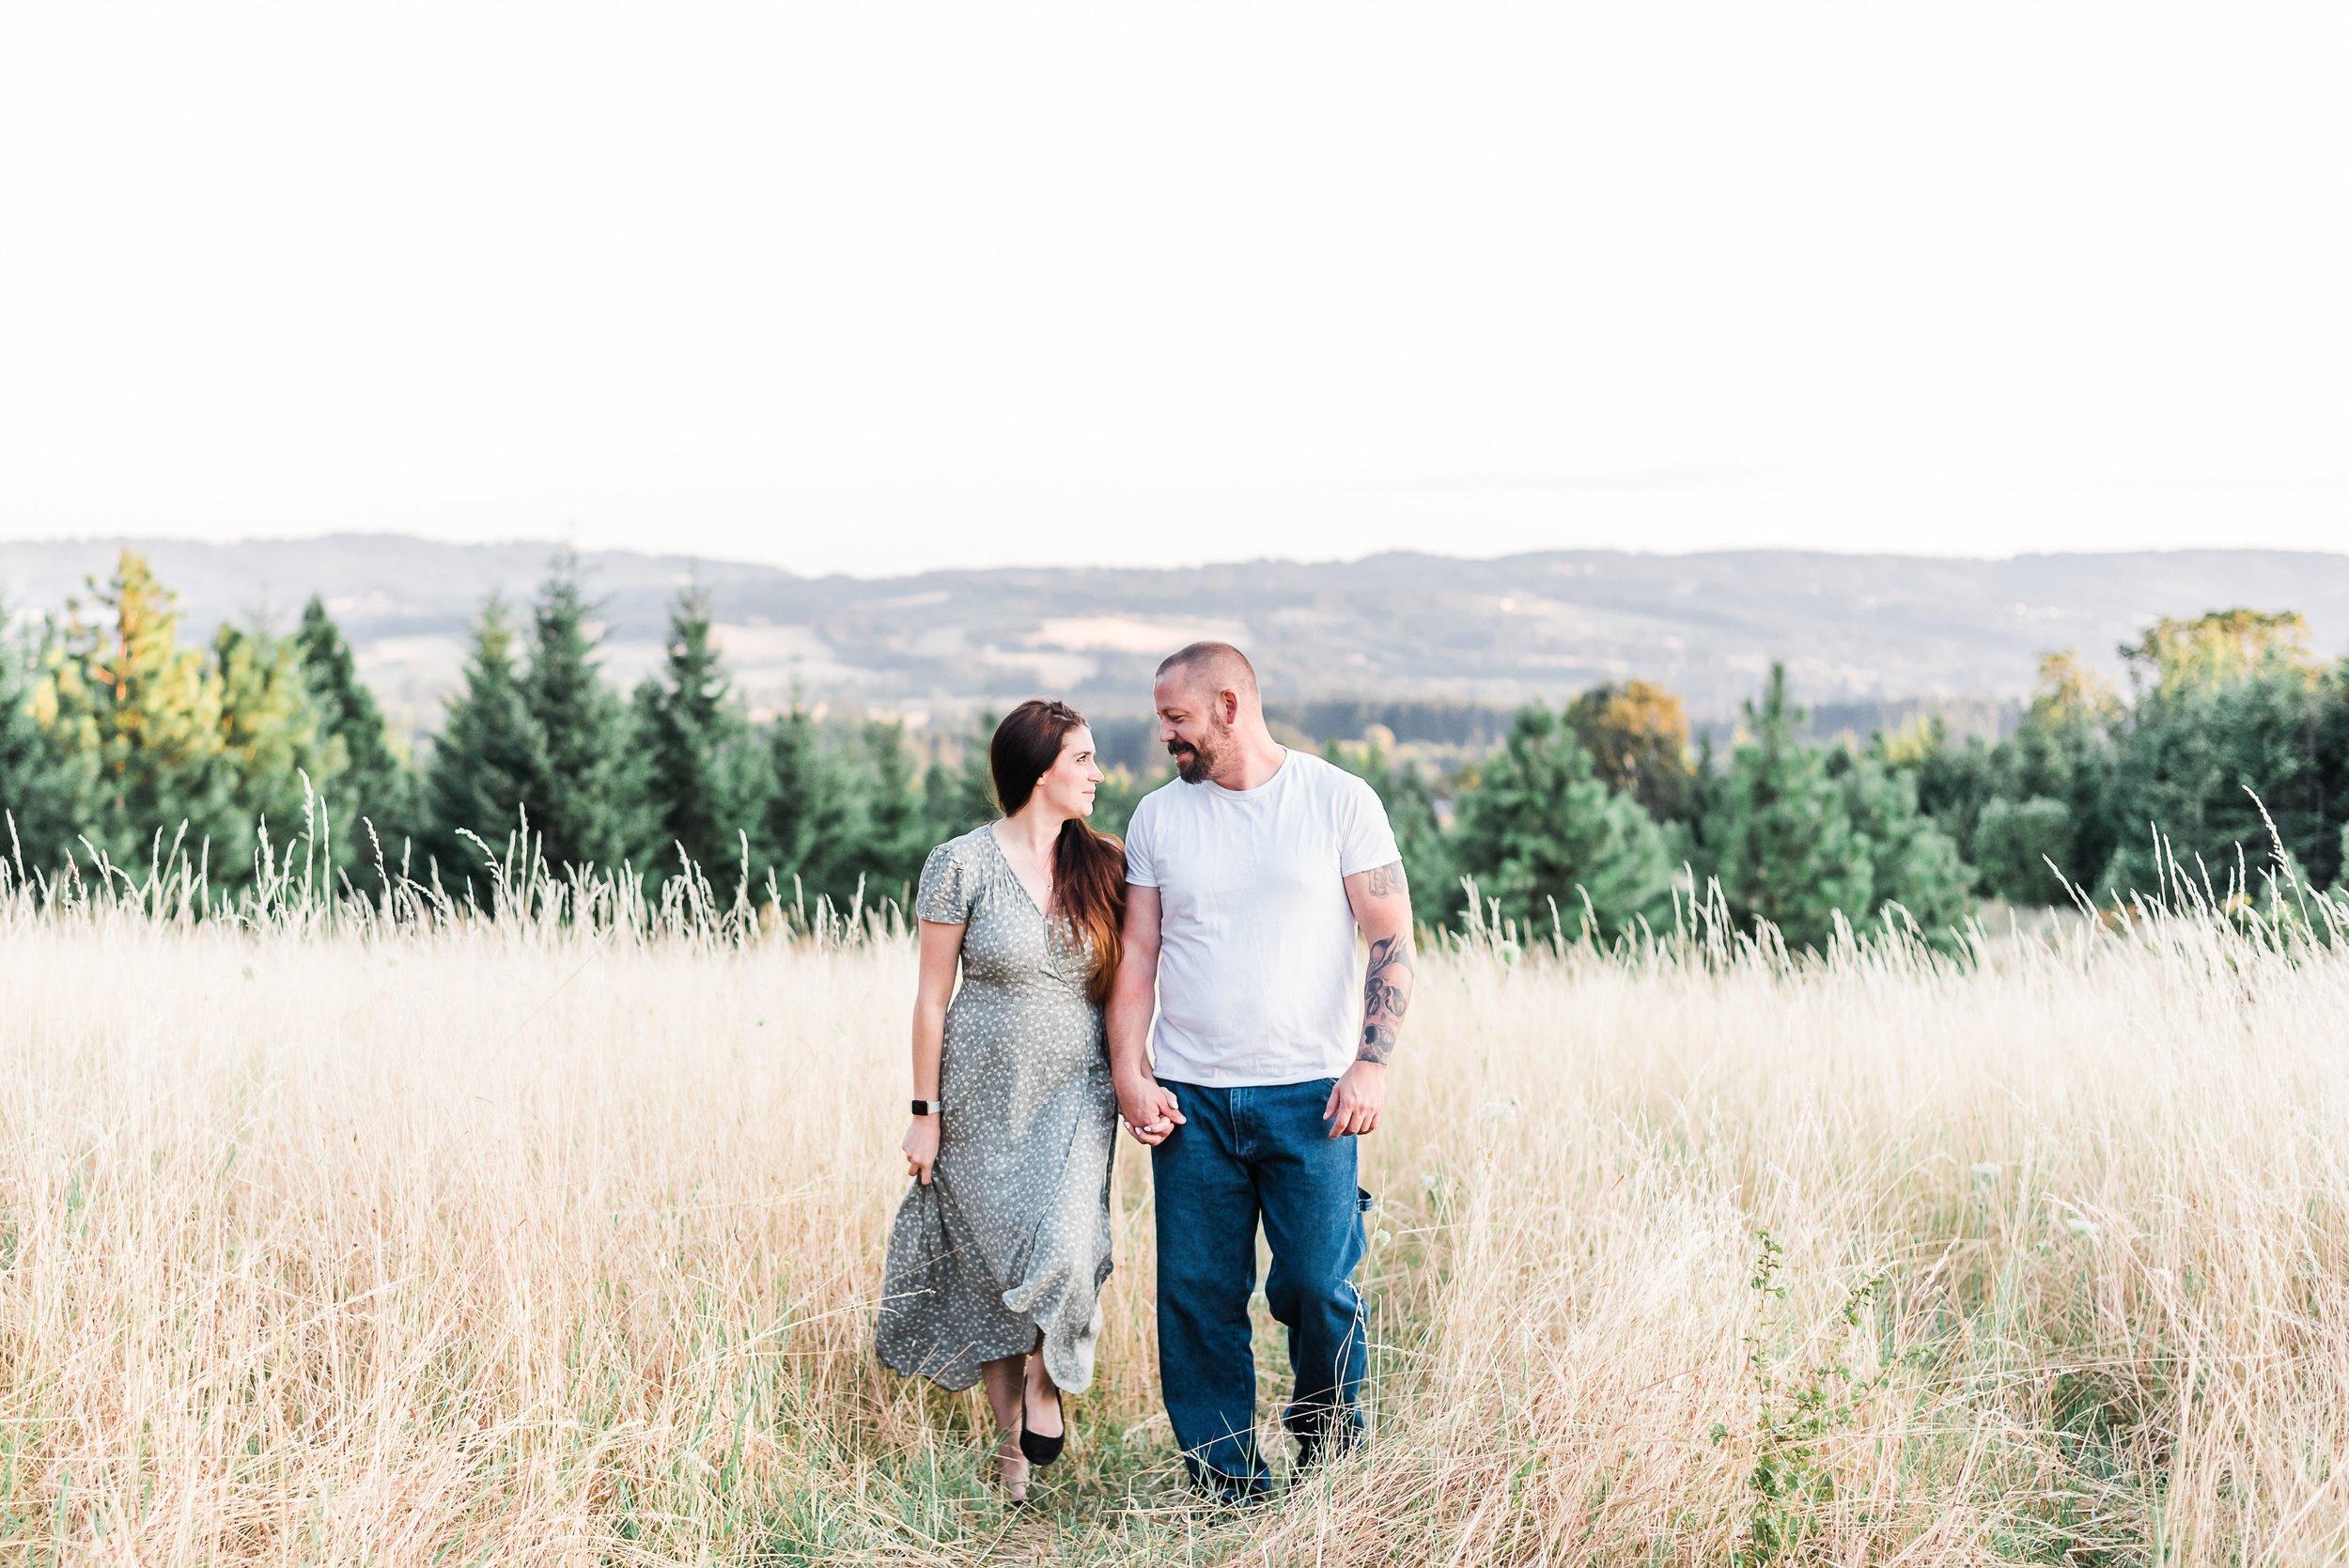 Summer golden hour engagement photos in Portland, Oregon. | Pacific Northwest family | Adventurous Oregon Bride | Portland, OR Photographer - Elizabeth Hite Photography